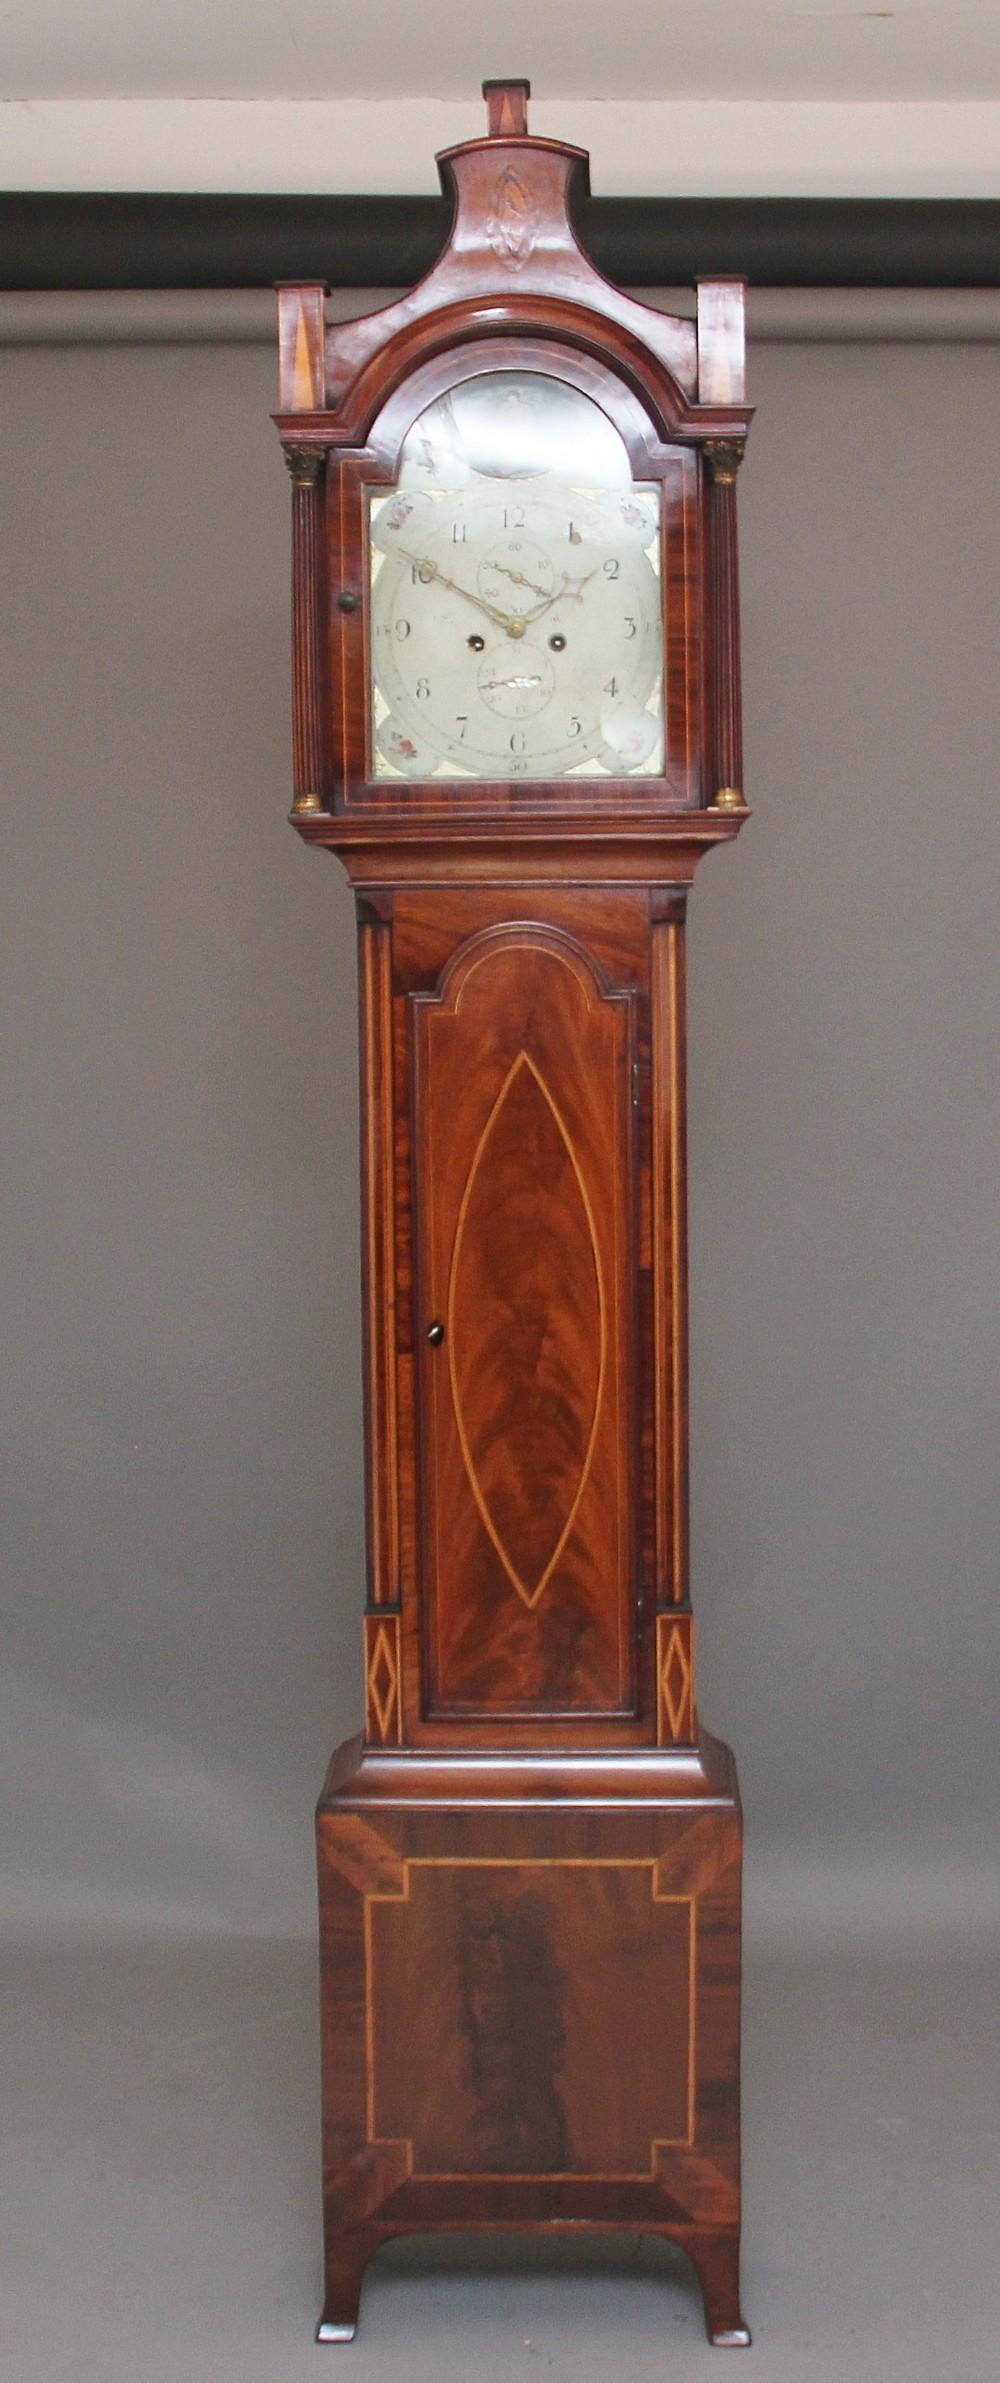 19th century mahogany and inlaid long case clock